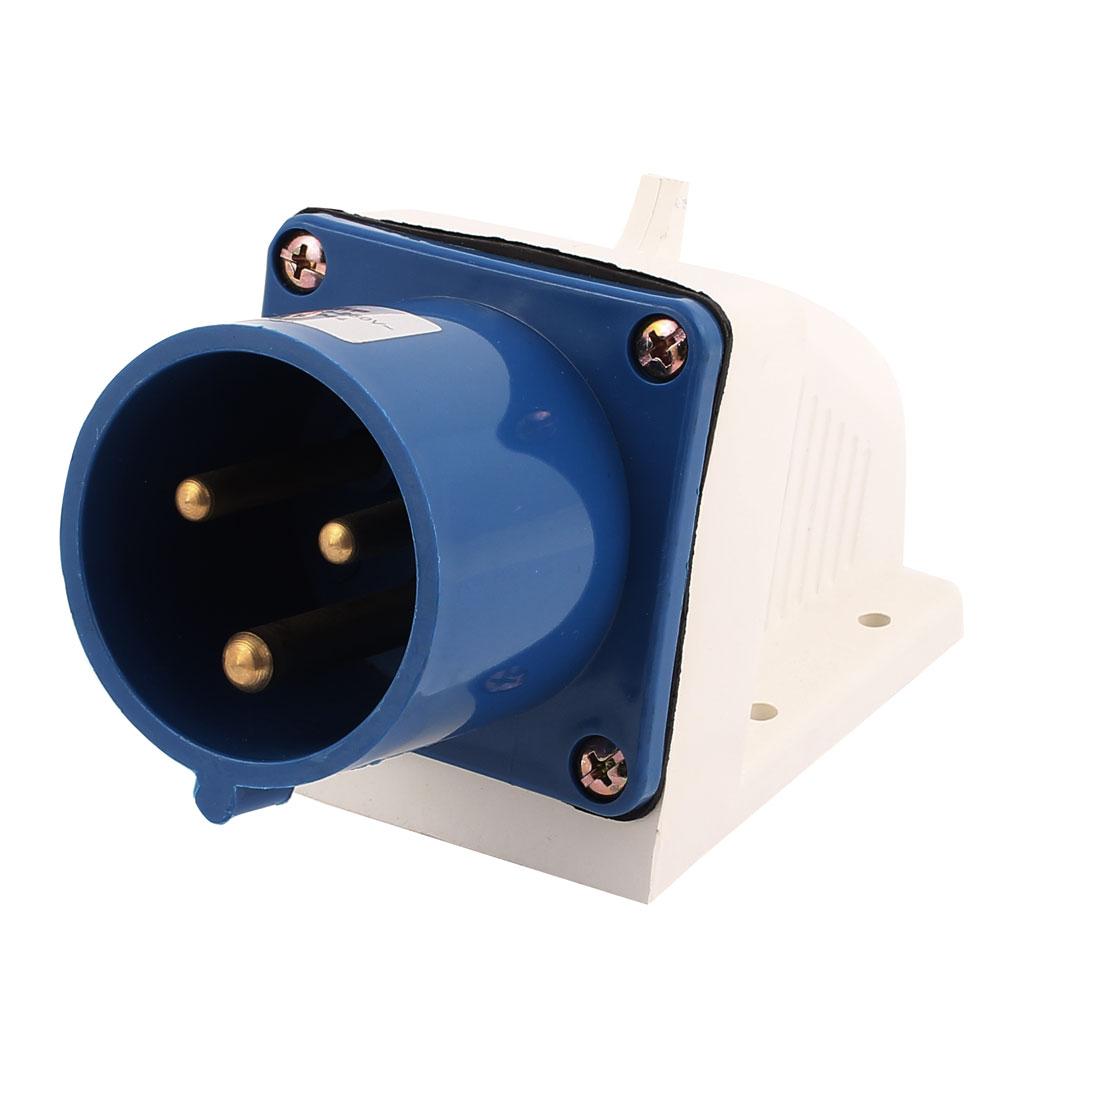 AC 220V-250V 32A IP44 2P+E 3-Terminal Male Industrial Caravan Panel Plug